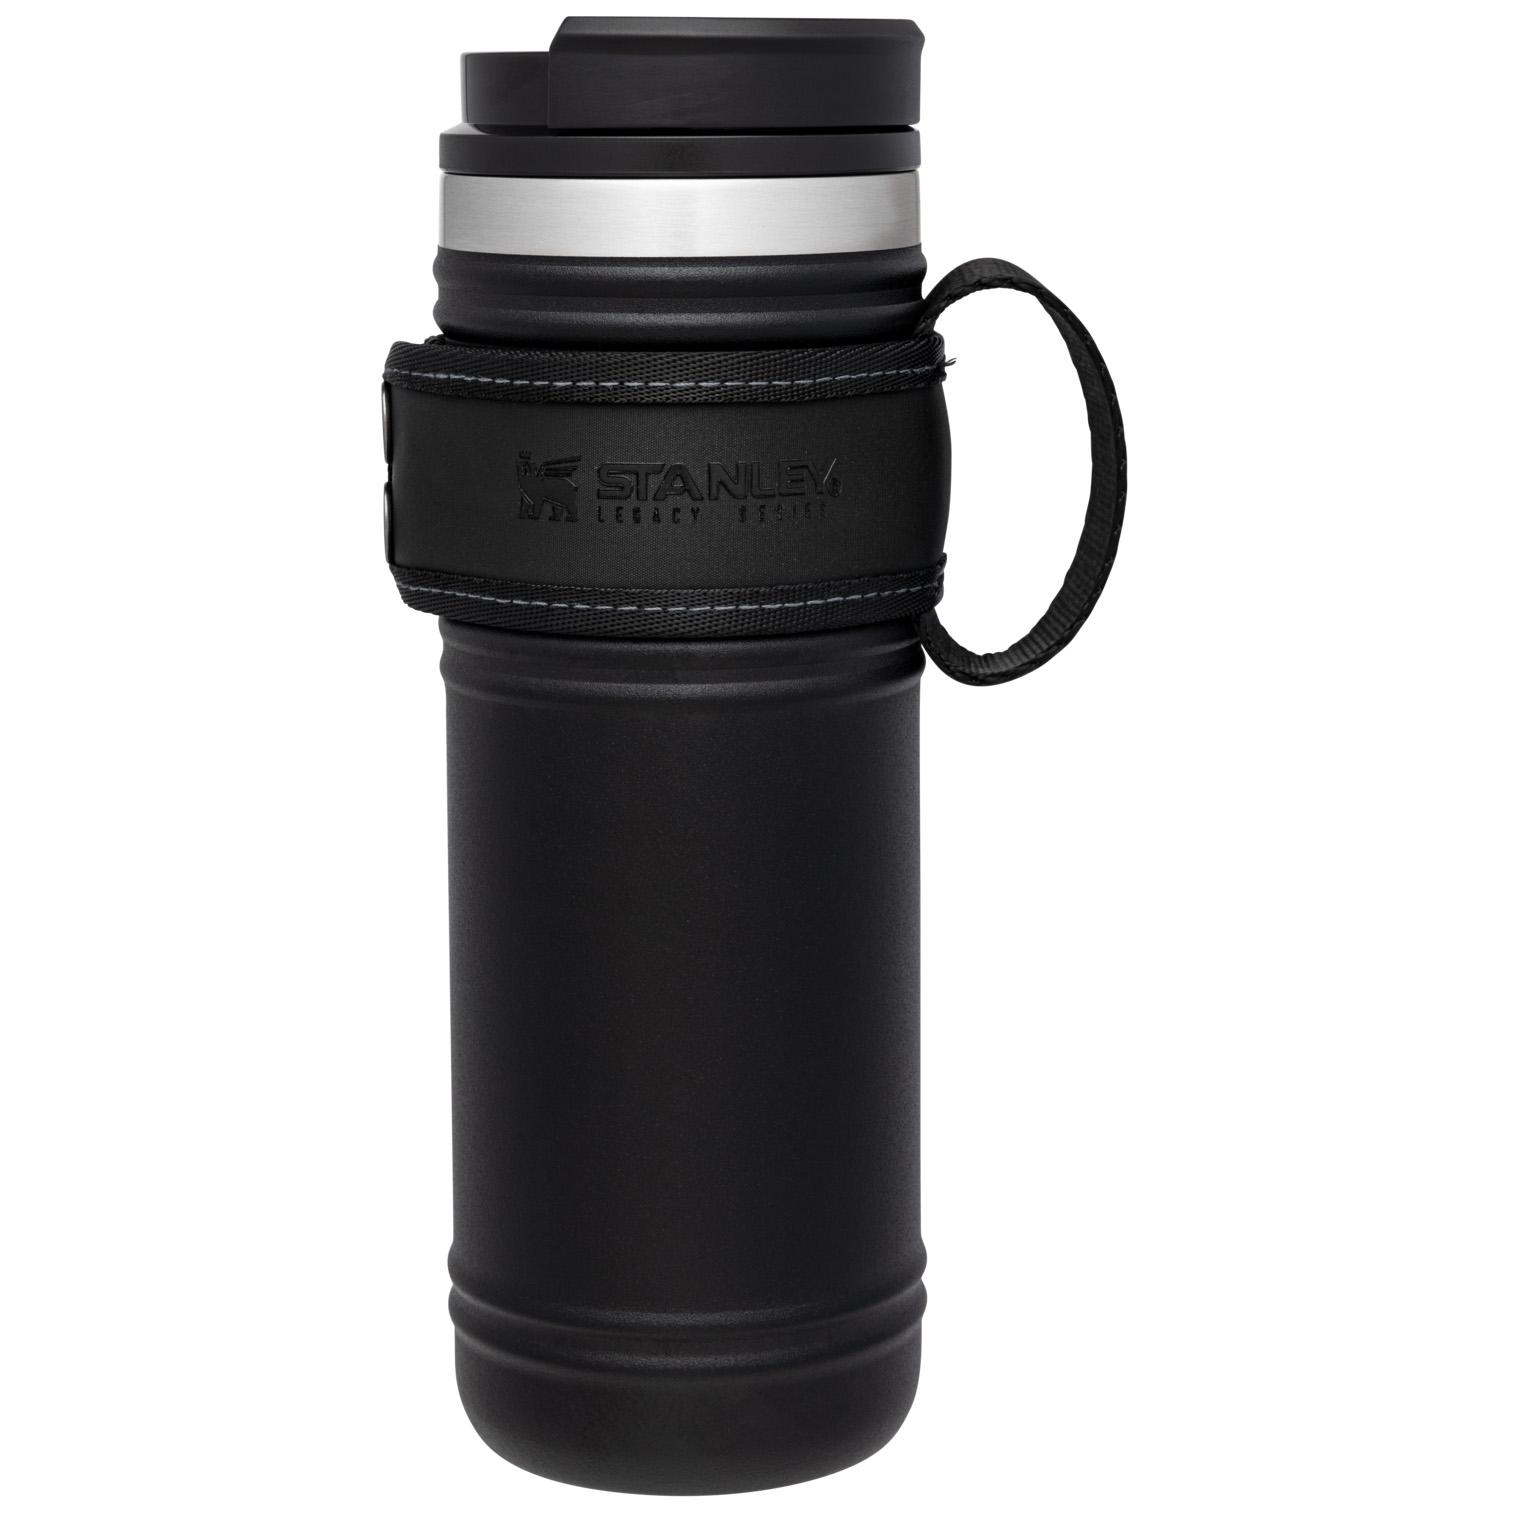 Stanley Legacy Neverleak™ Travel Mug | 16 oz – Black